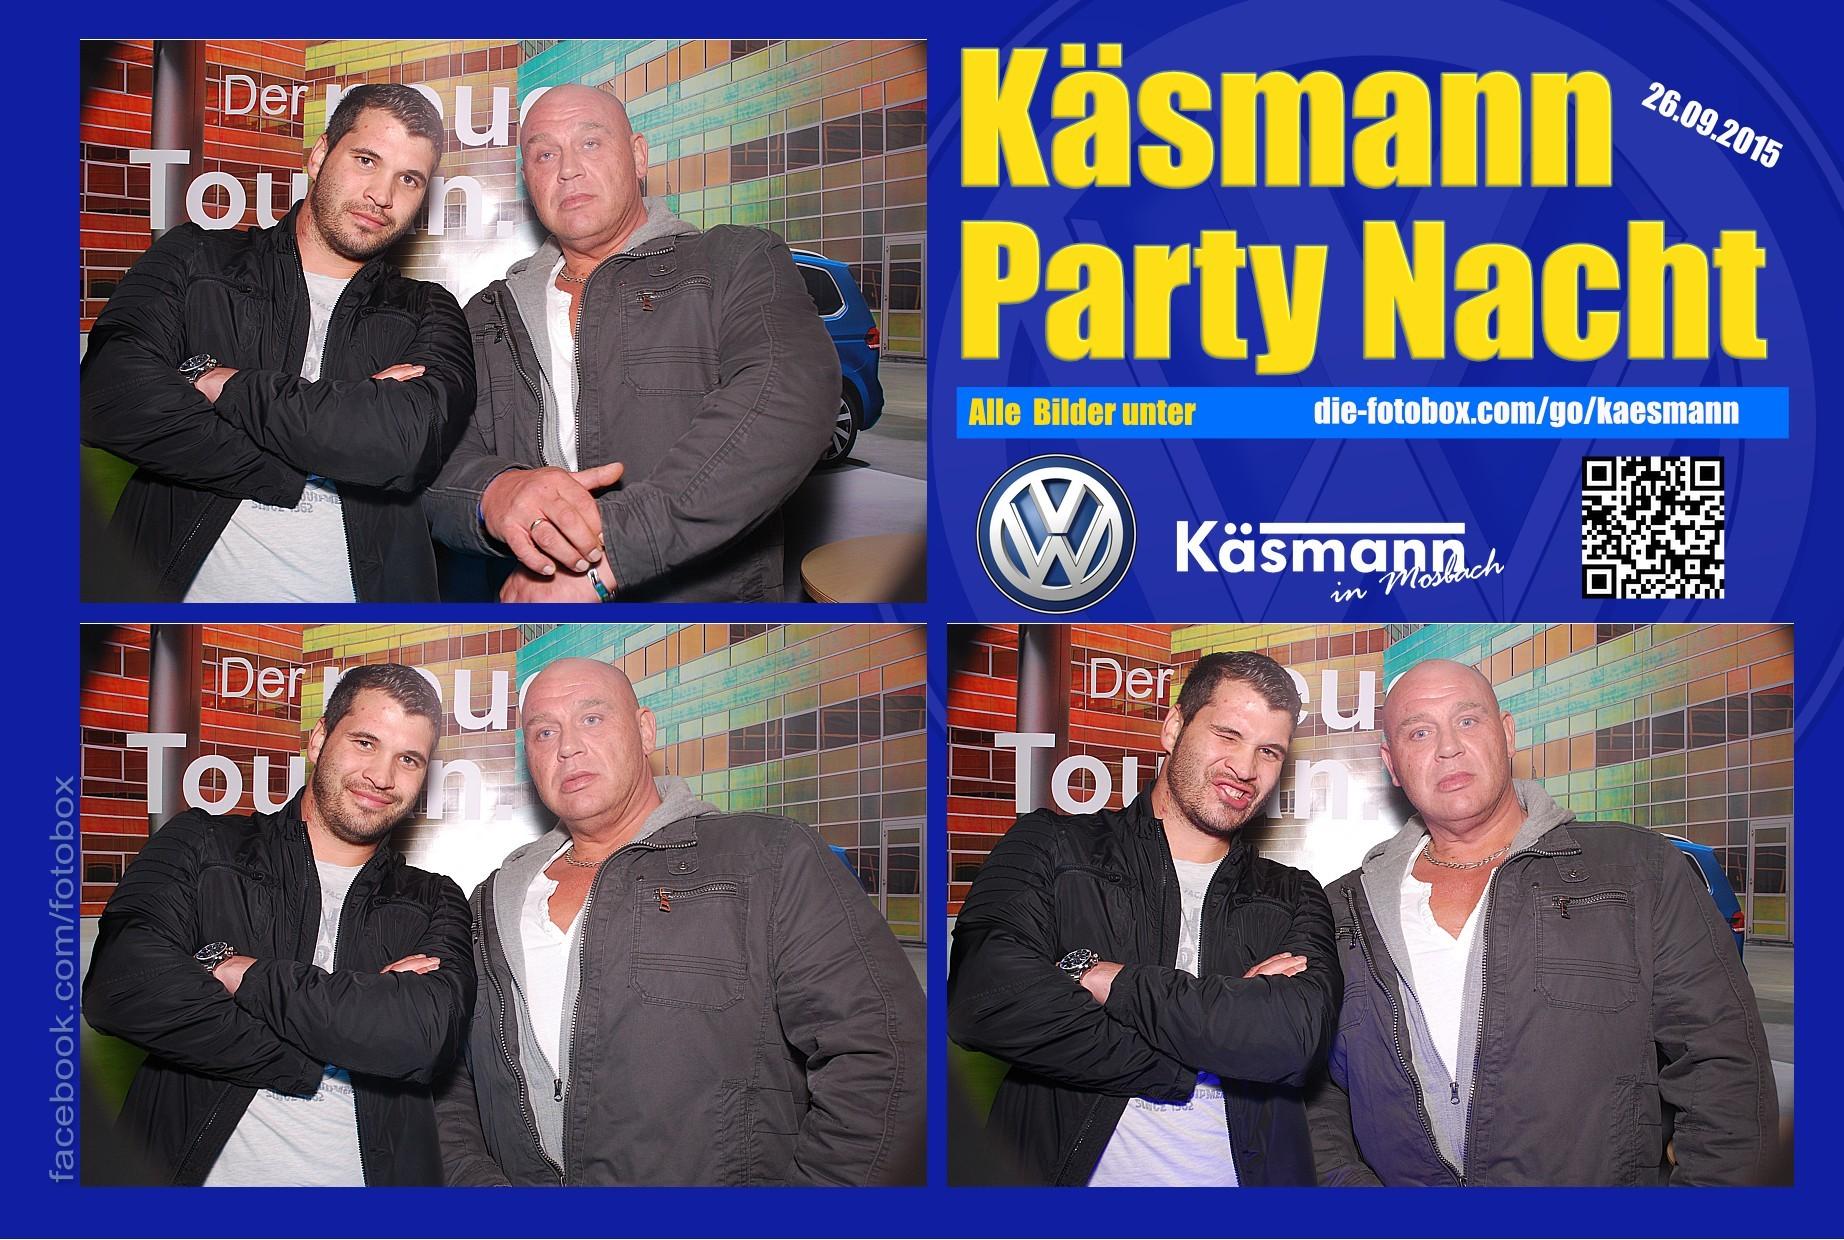 Käsmannparty 2015 - www.die-fotobox.com 01244